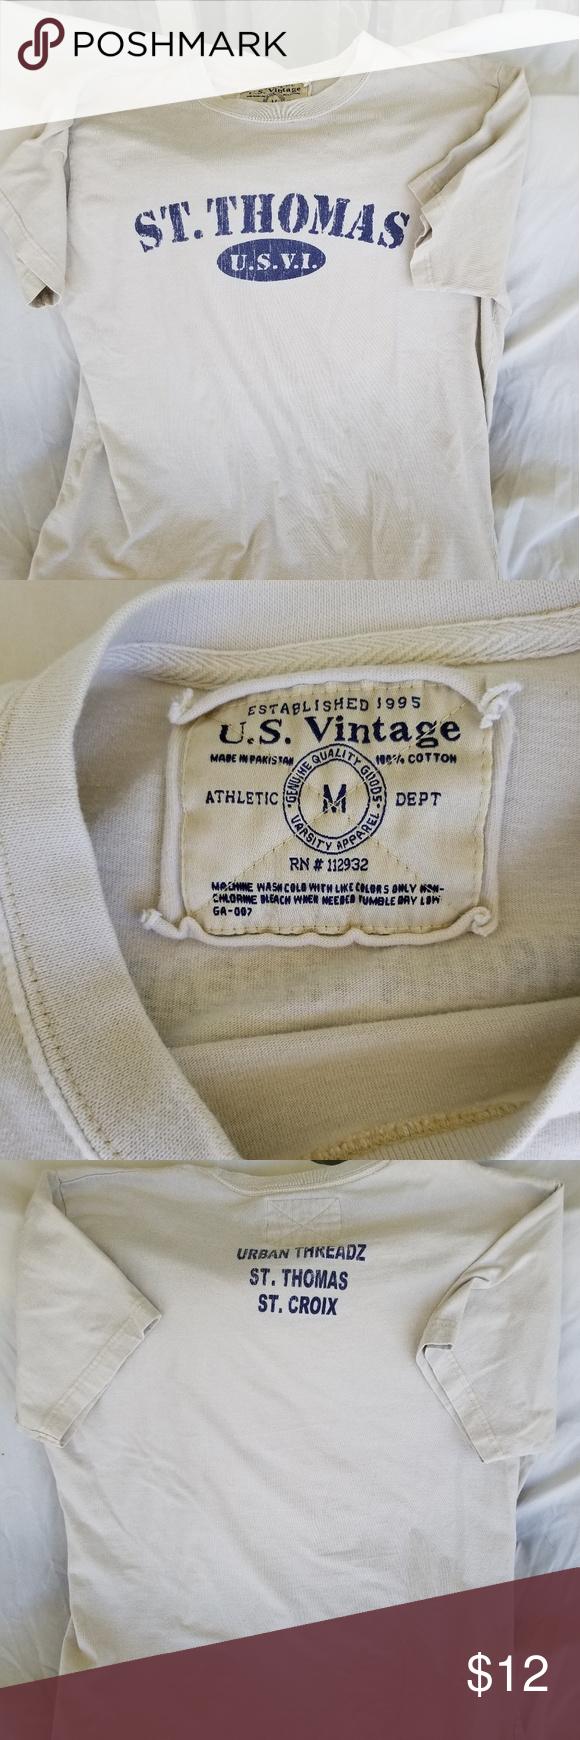 Usvi T Shirt St Thomas Usvi T Shirt Size Medium In Gently Used Condition Us Vintage Shirts Tees Short Sleeve Vintage Shirts Clothes Design T Shirt